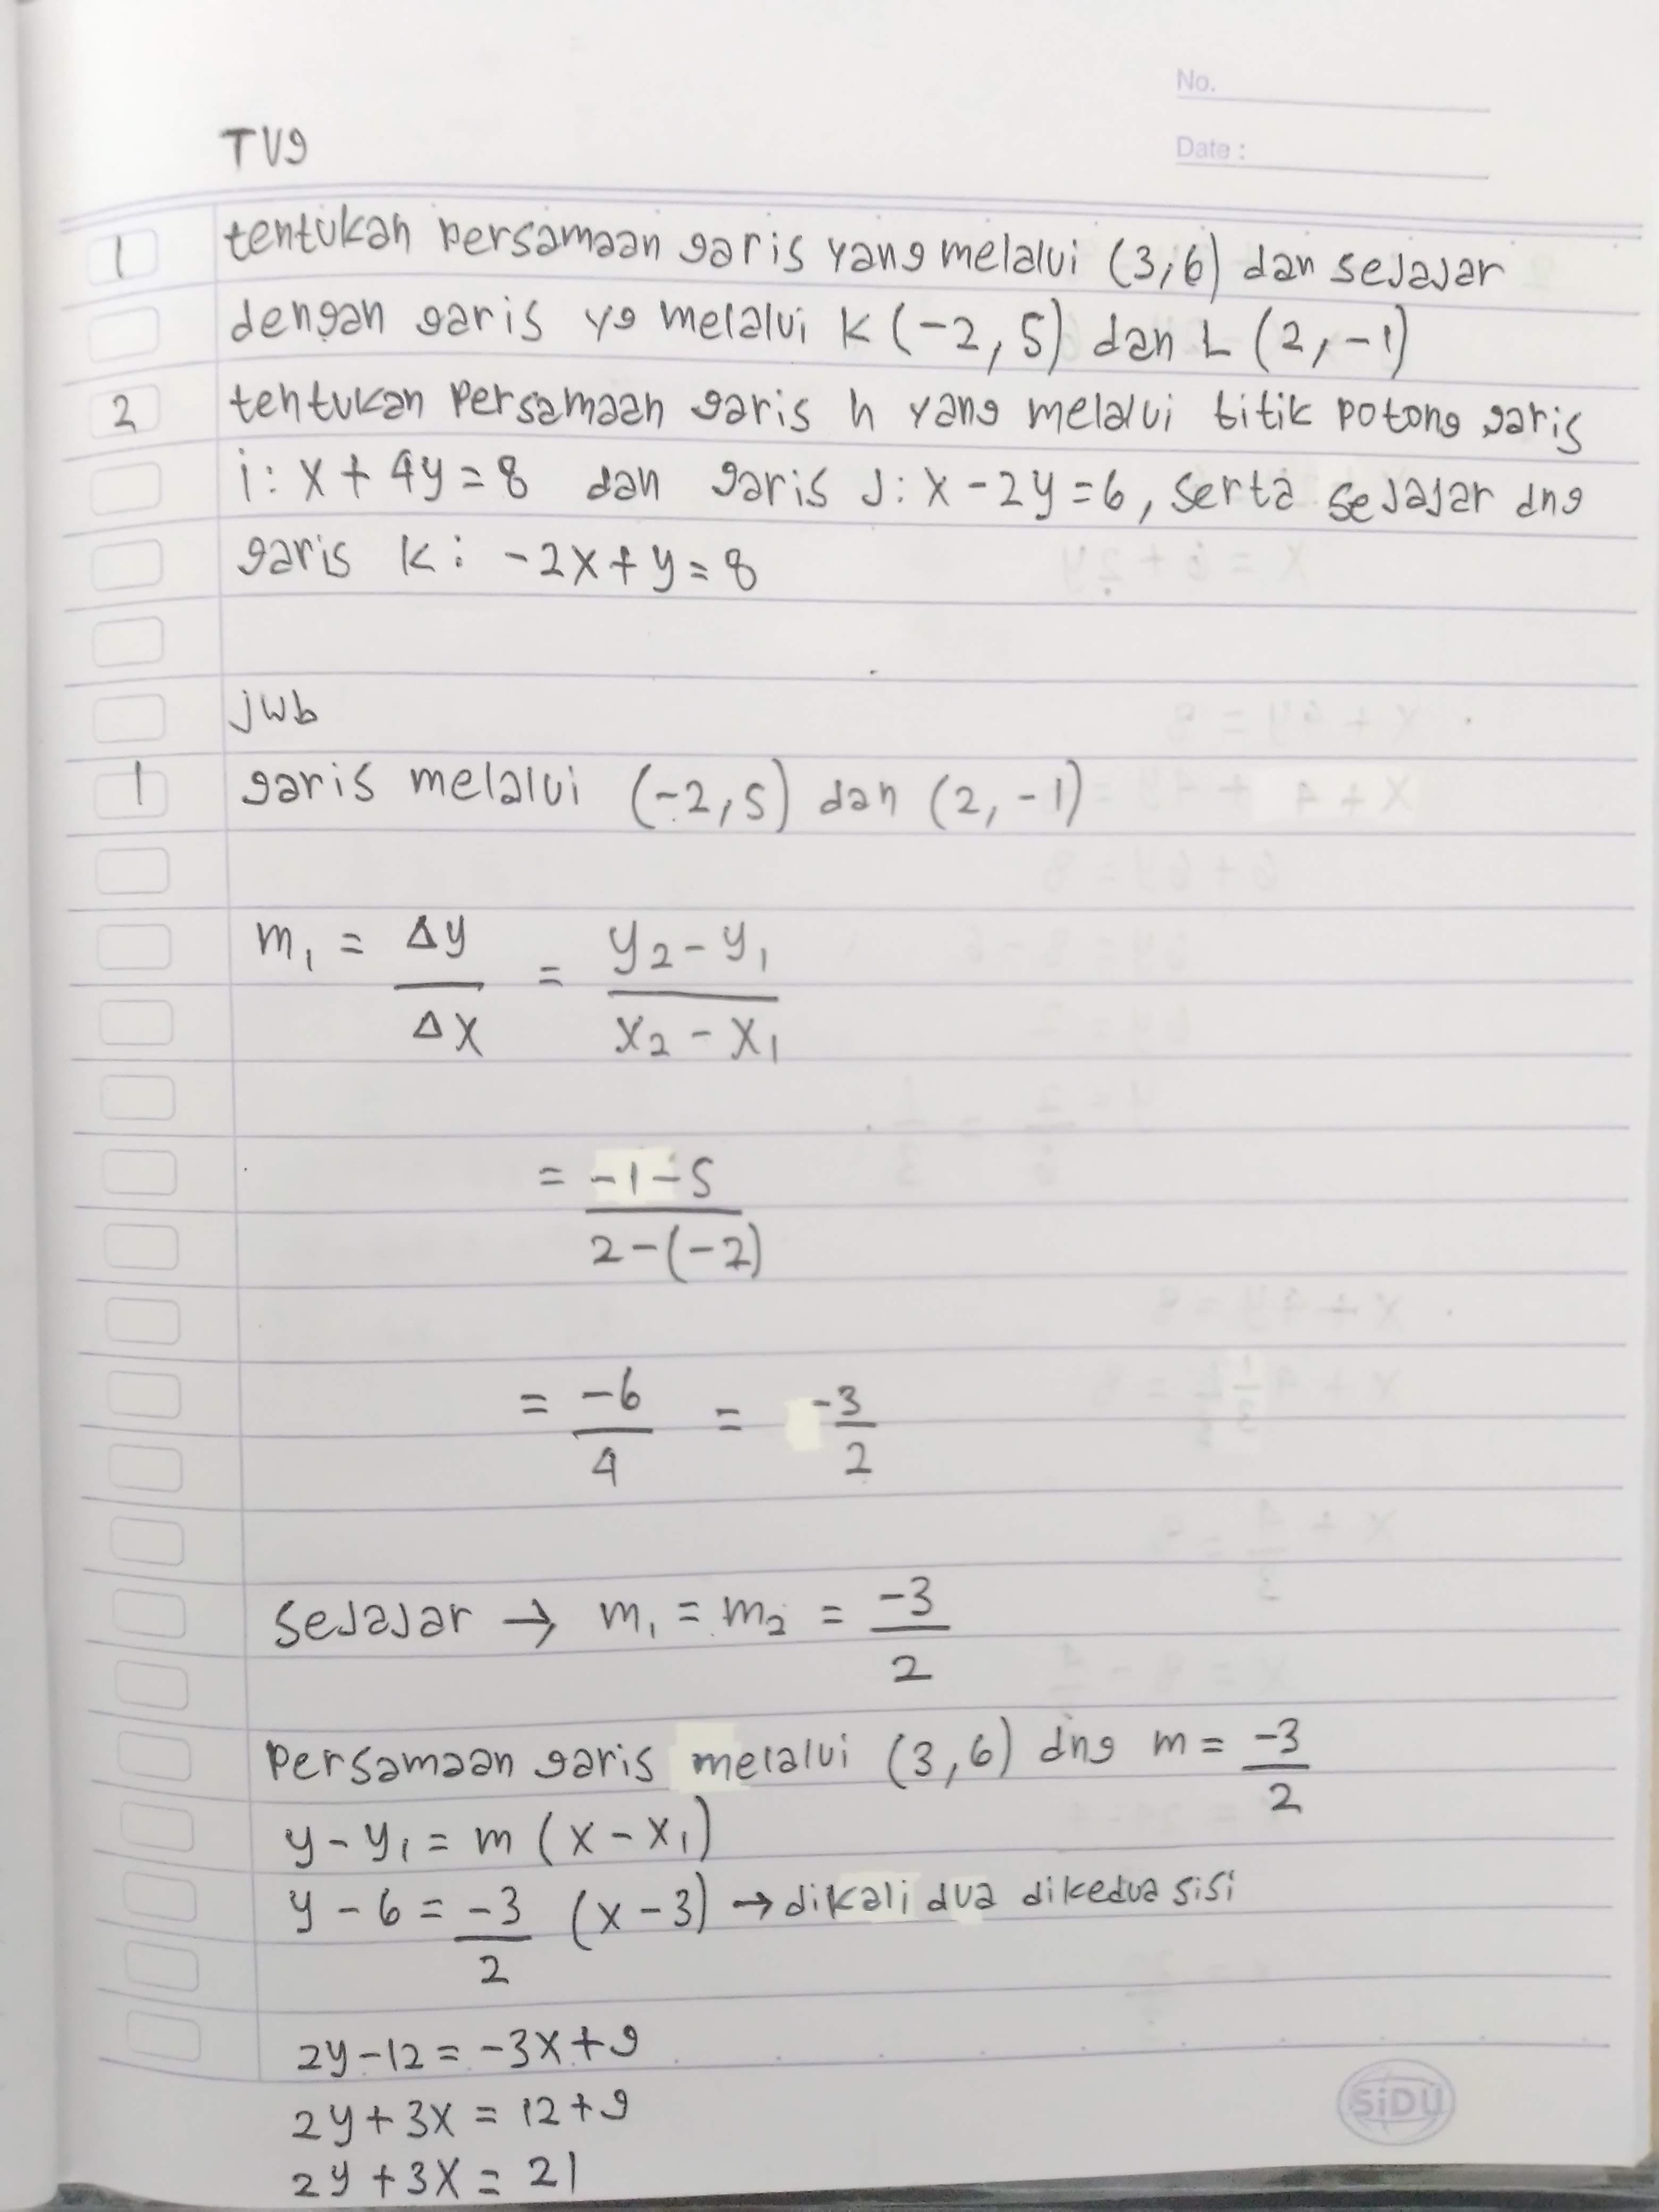 Jawaban TV9 Matematika hari ini